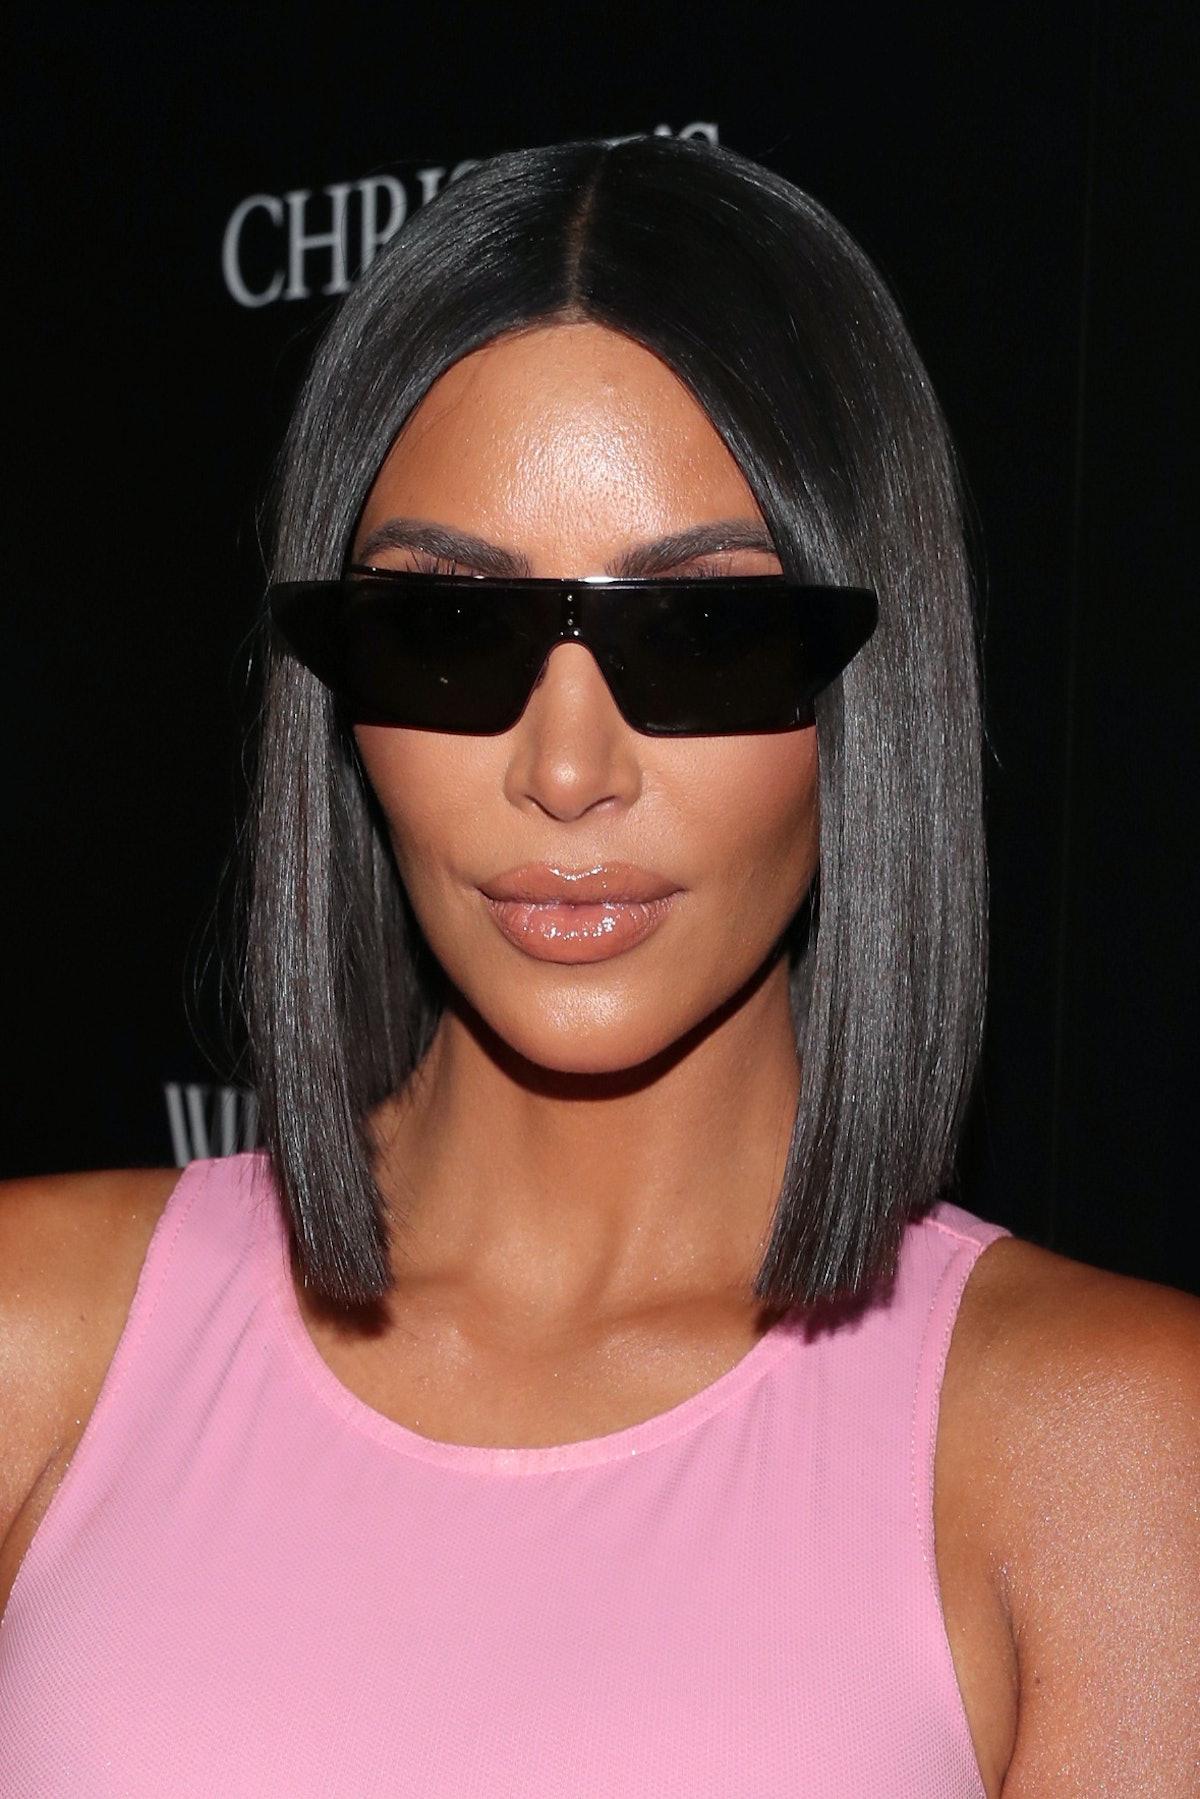 Kim Kardashian sports a super sleek bob at a Christie's event in 2018.